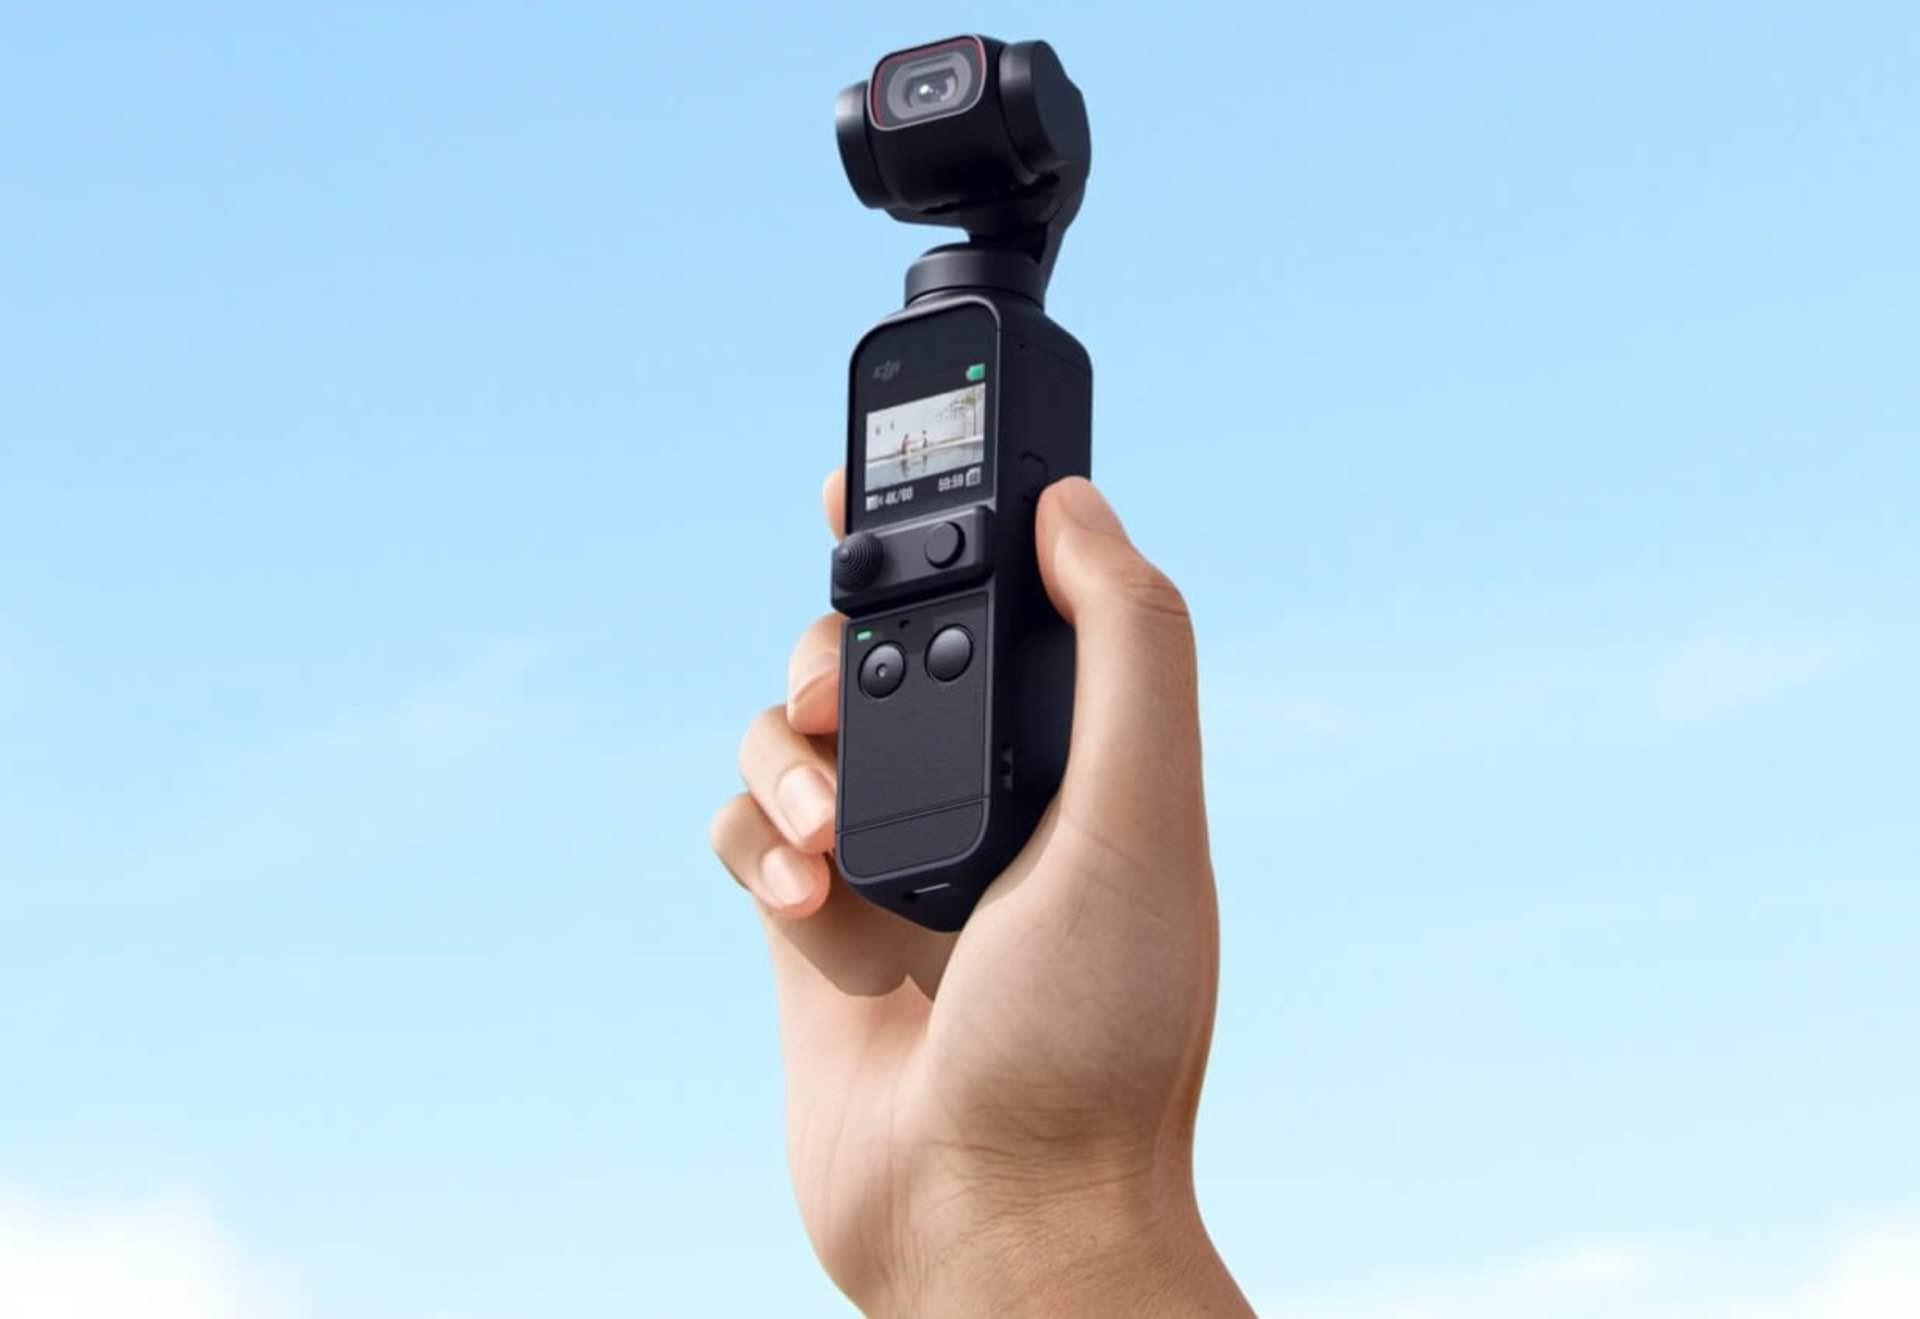 dji-pocket-2-handheld-video-stabilizer-and-camera-2